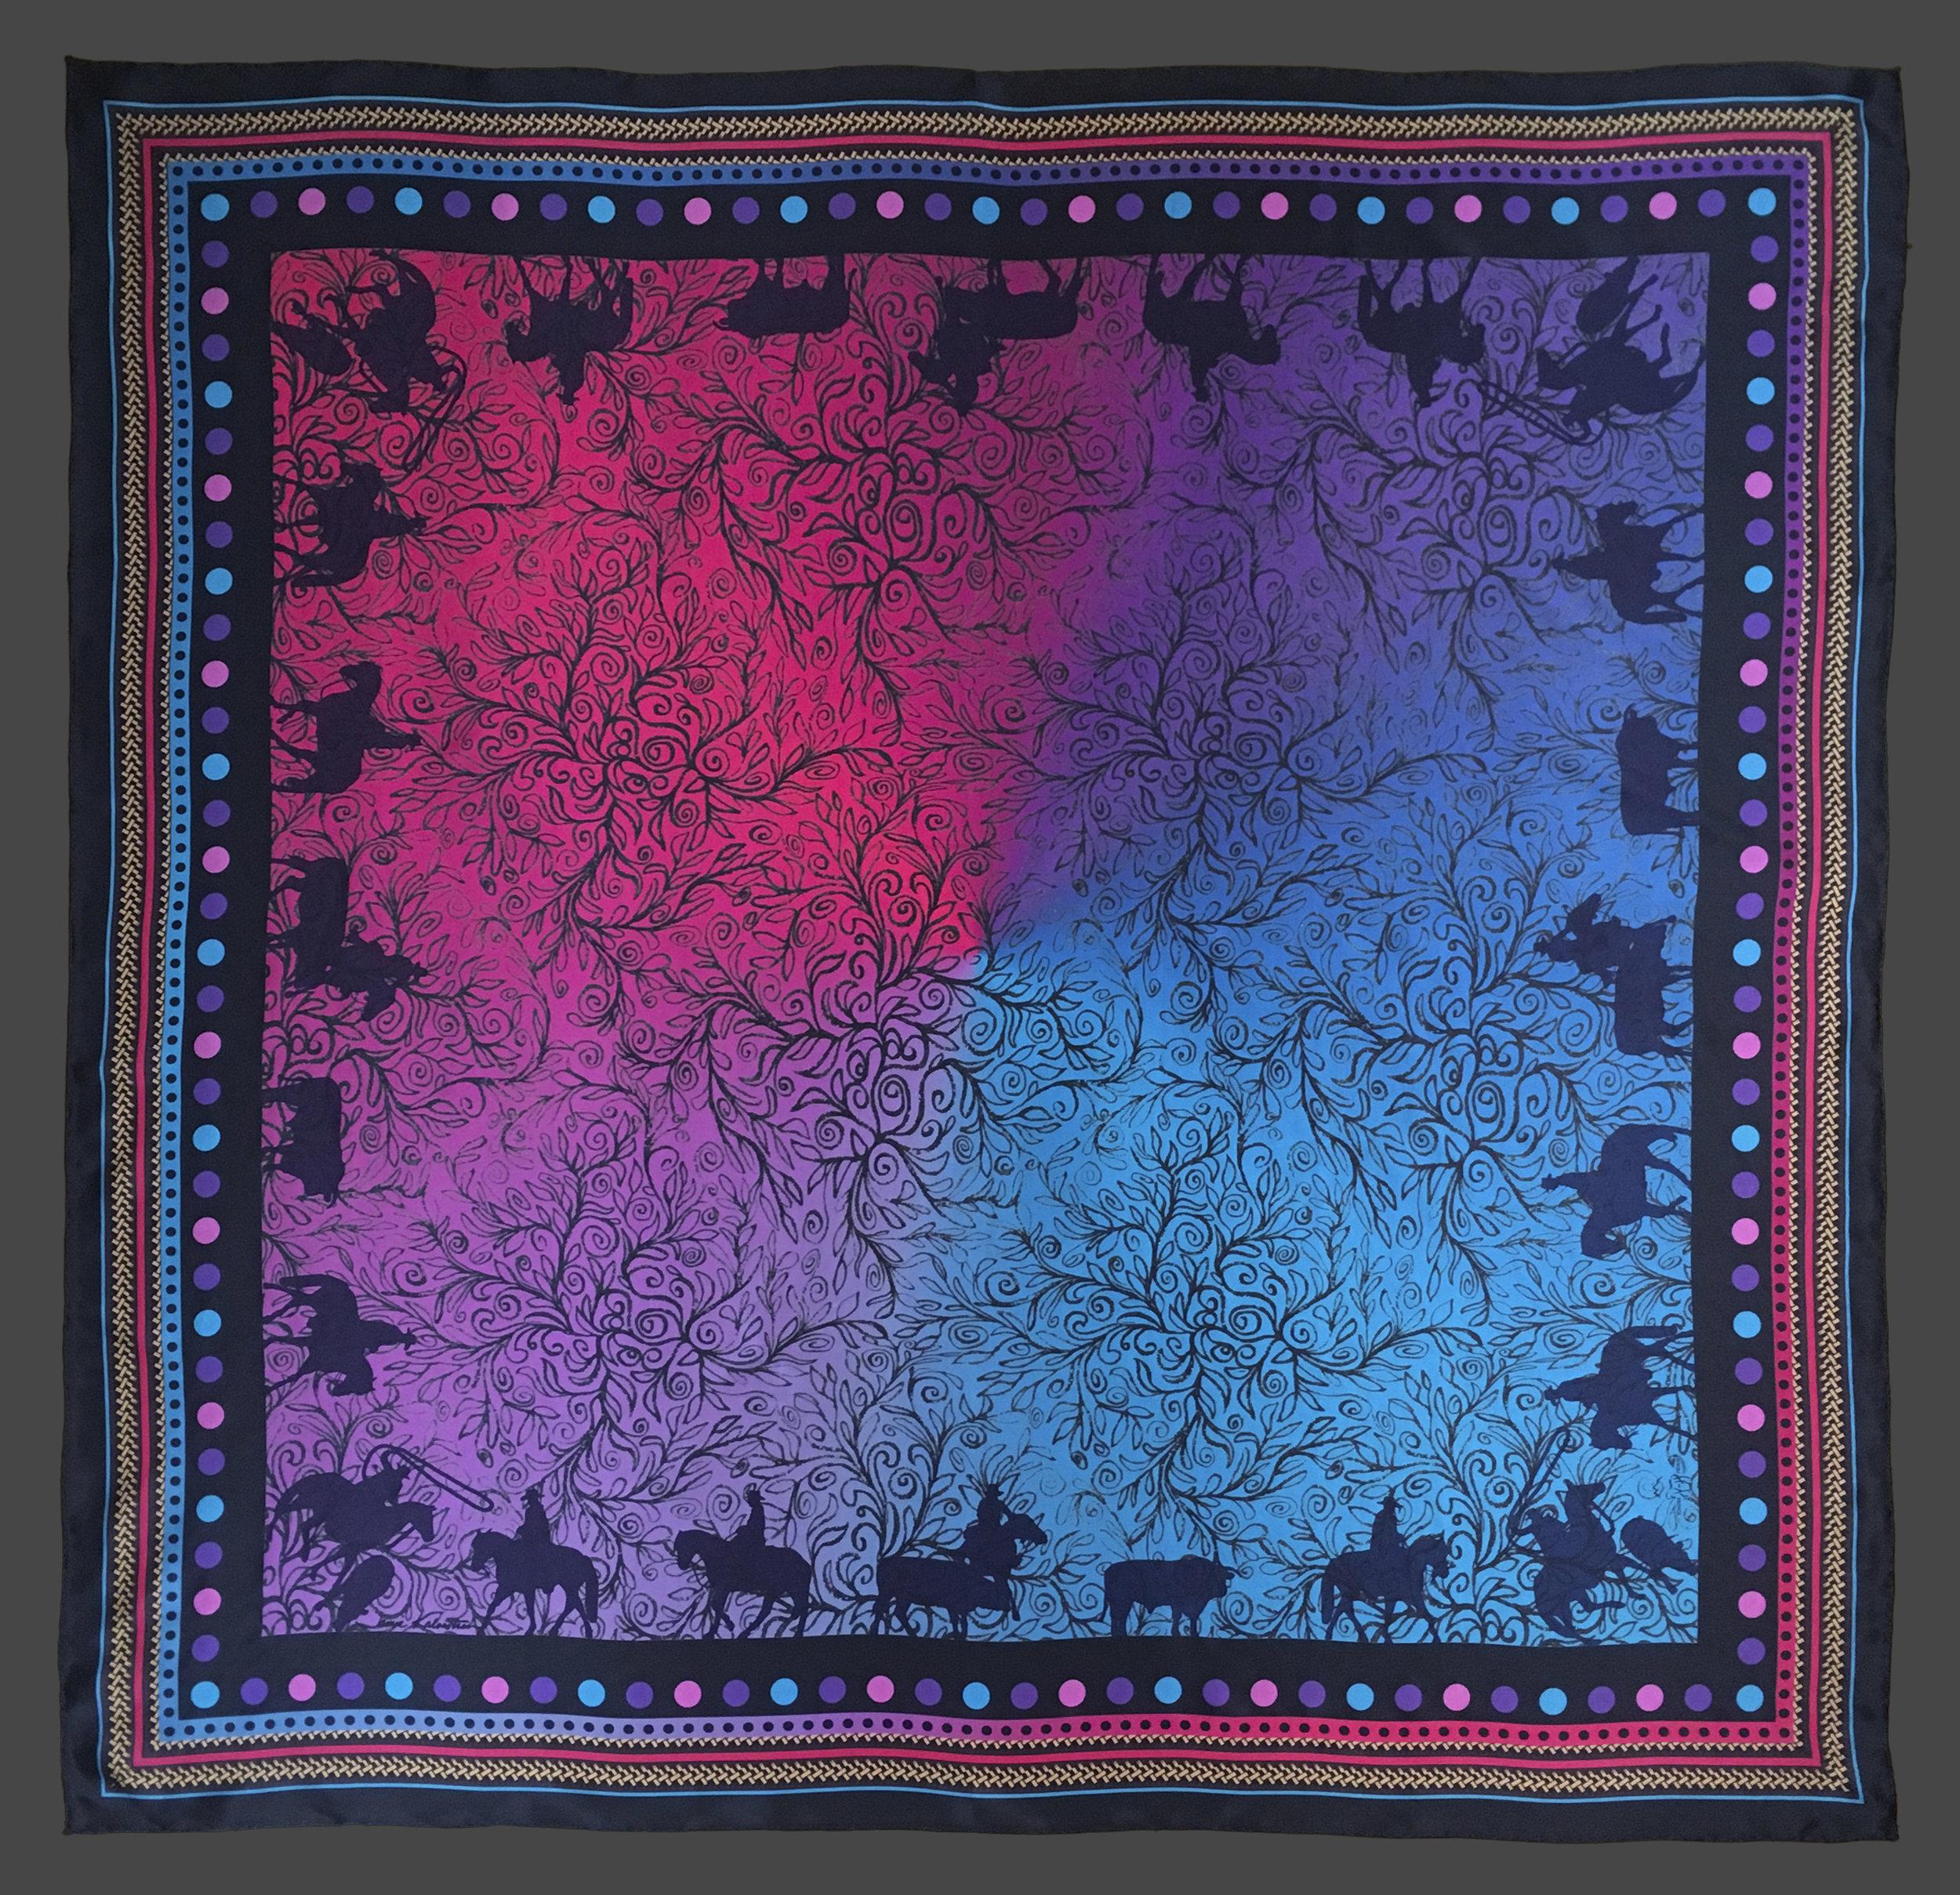 YH-WR-Cowwork-Purp-red-Square-Grey-1.jpg